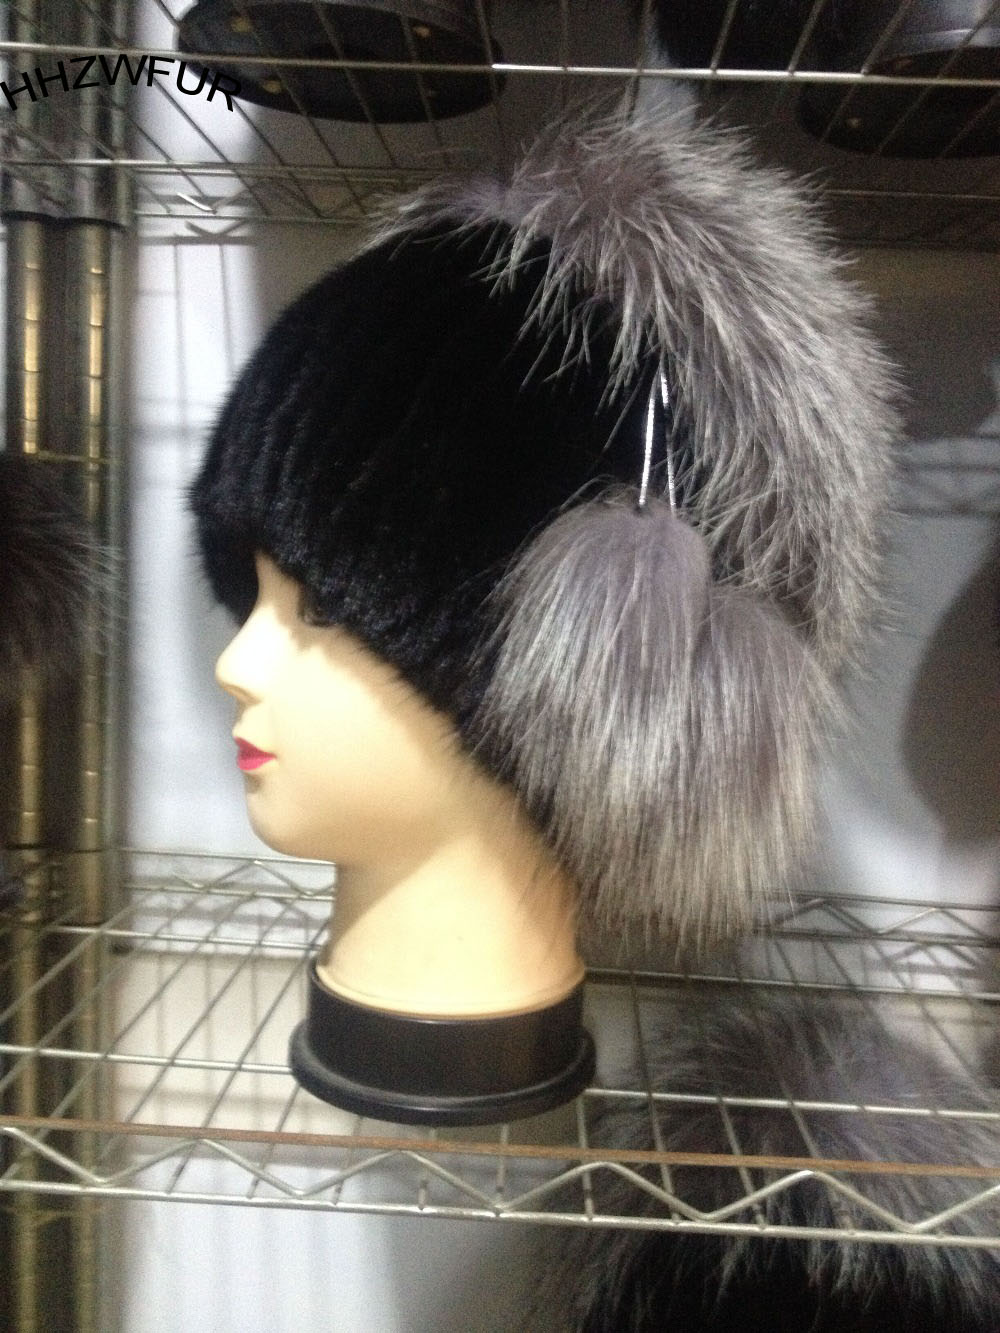 HHZWFUR wholesale real free shopping fashion fur mink fox cap